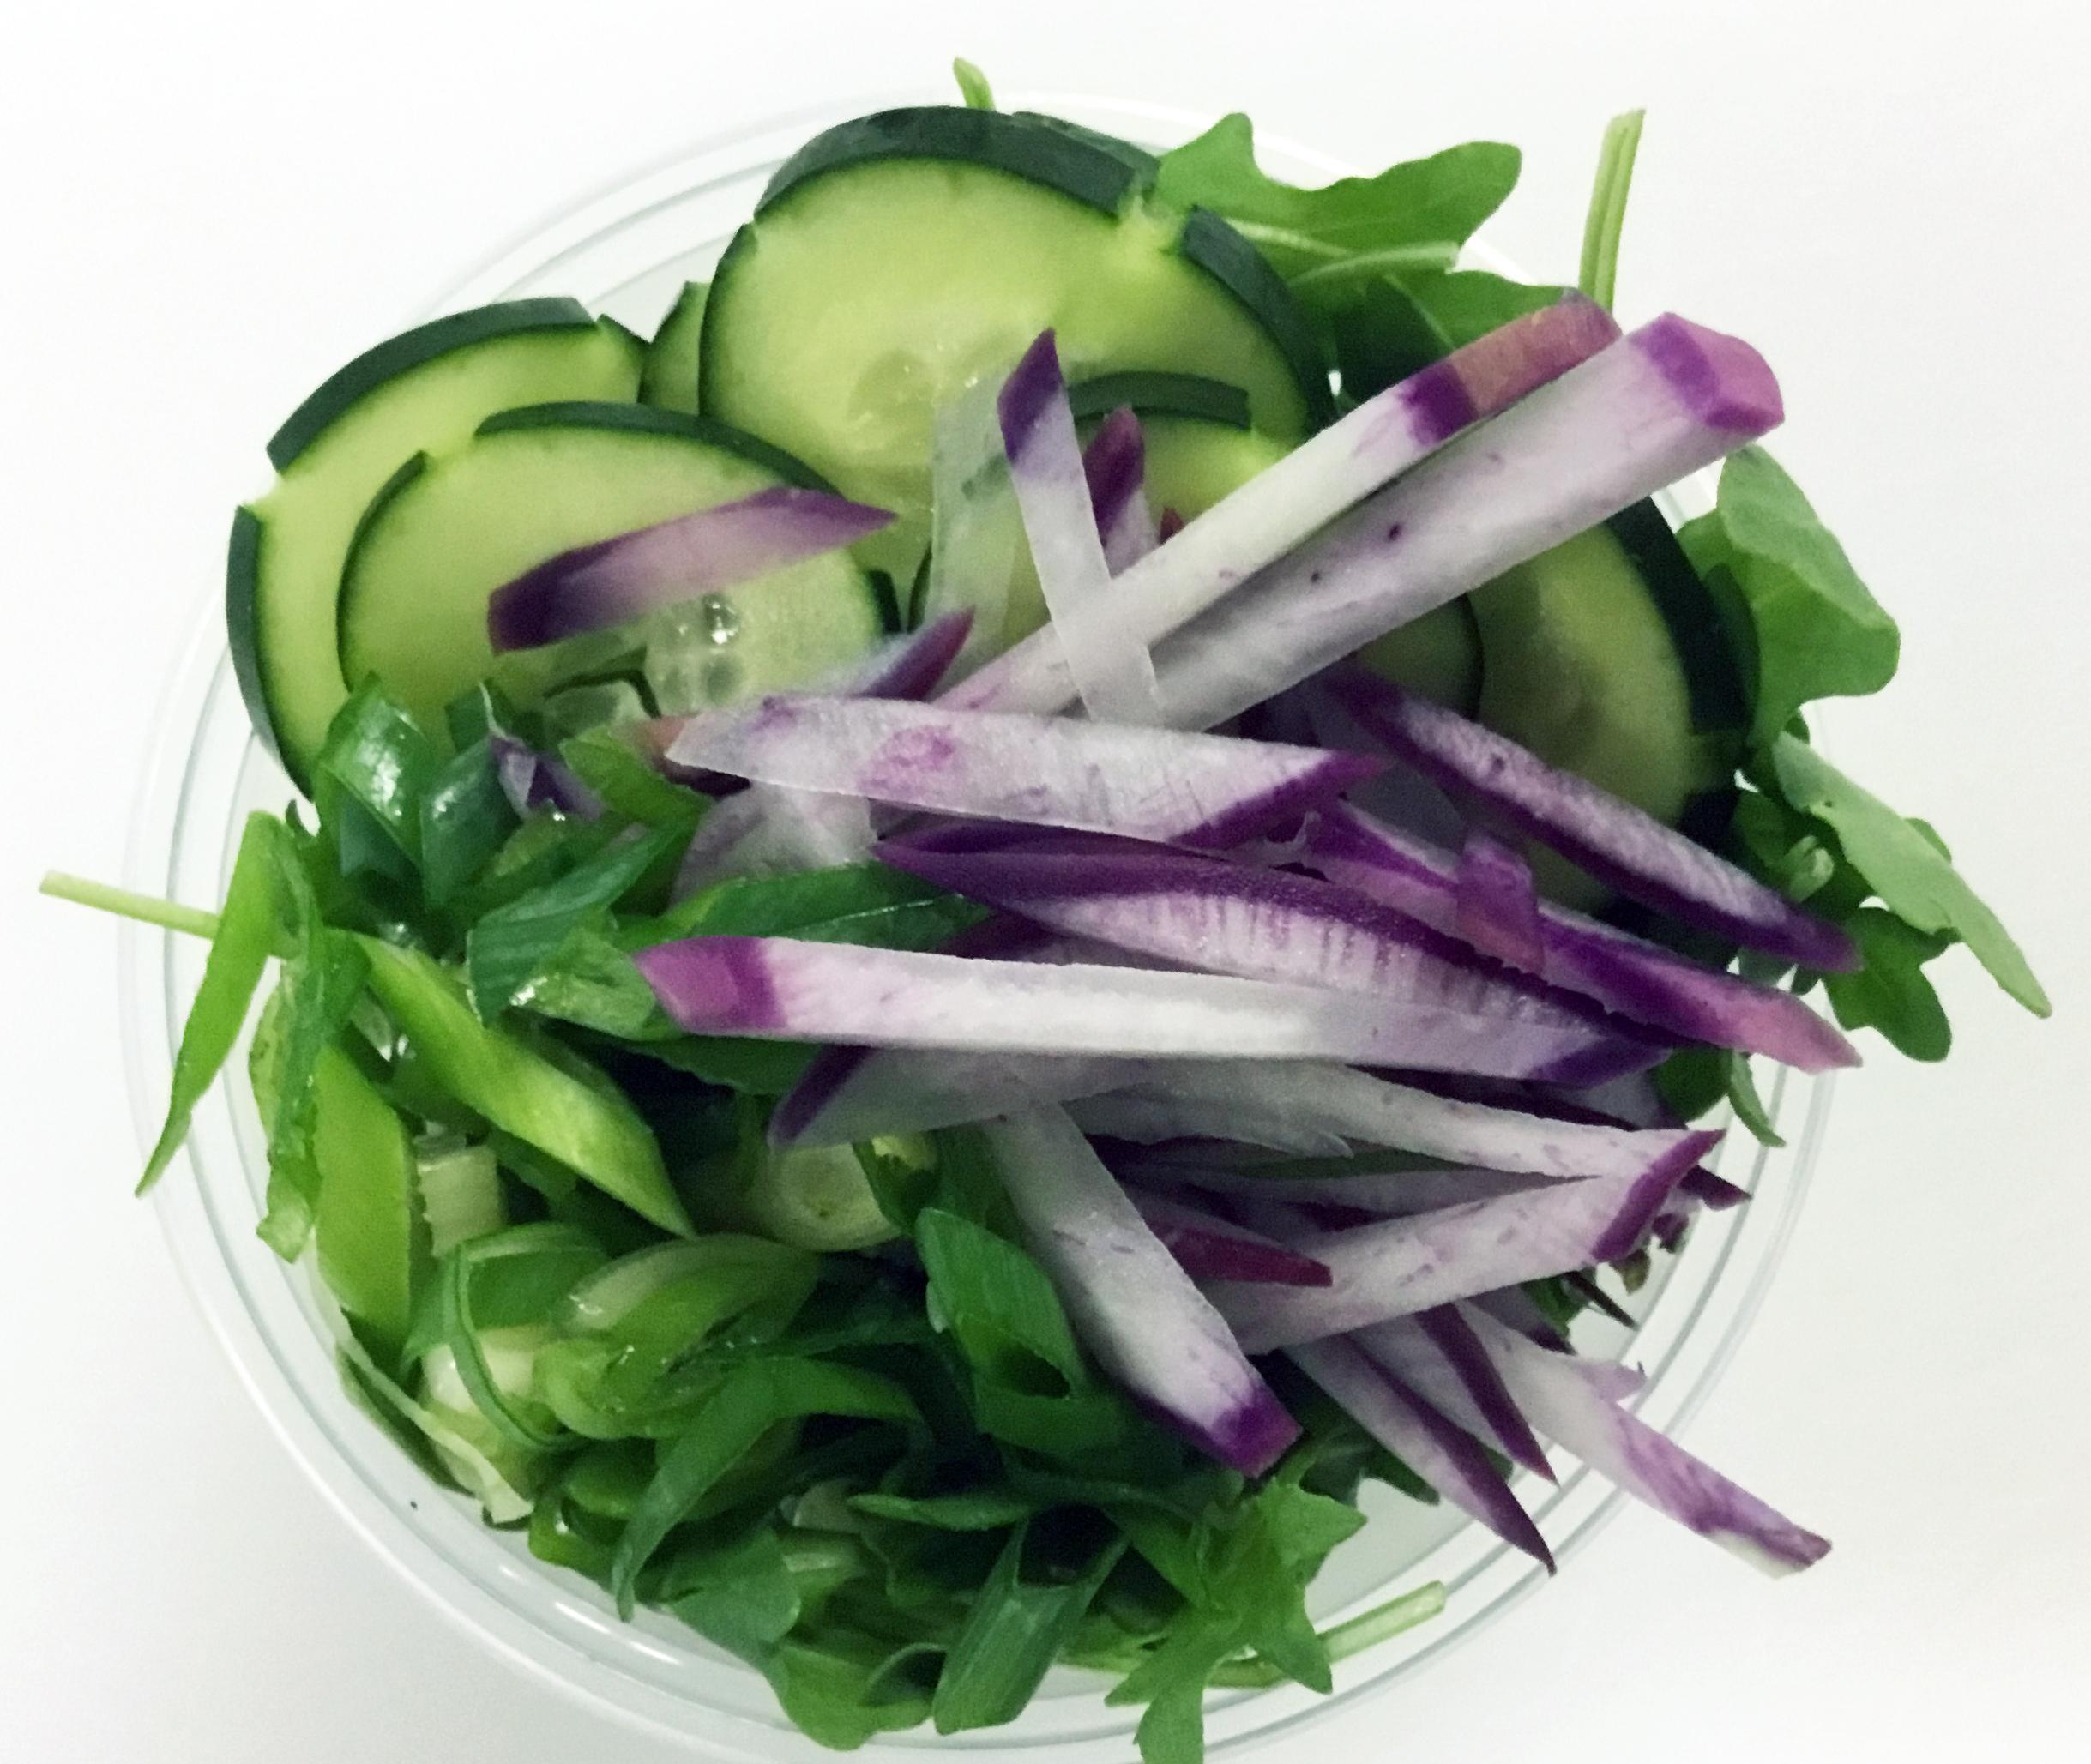 Arugula with purple radish, cucumber and scallions.